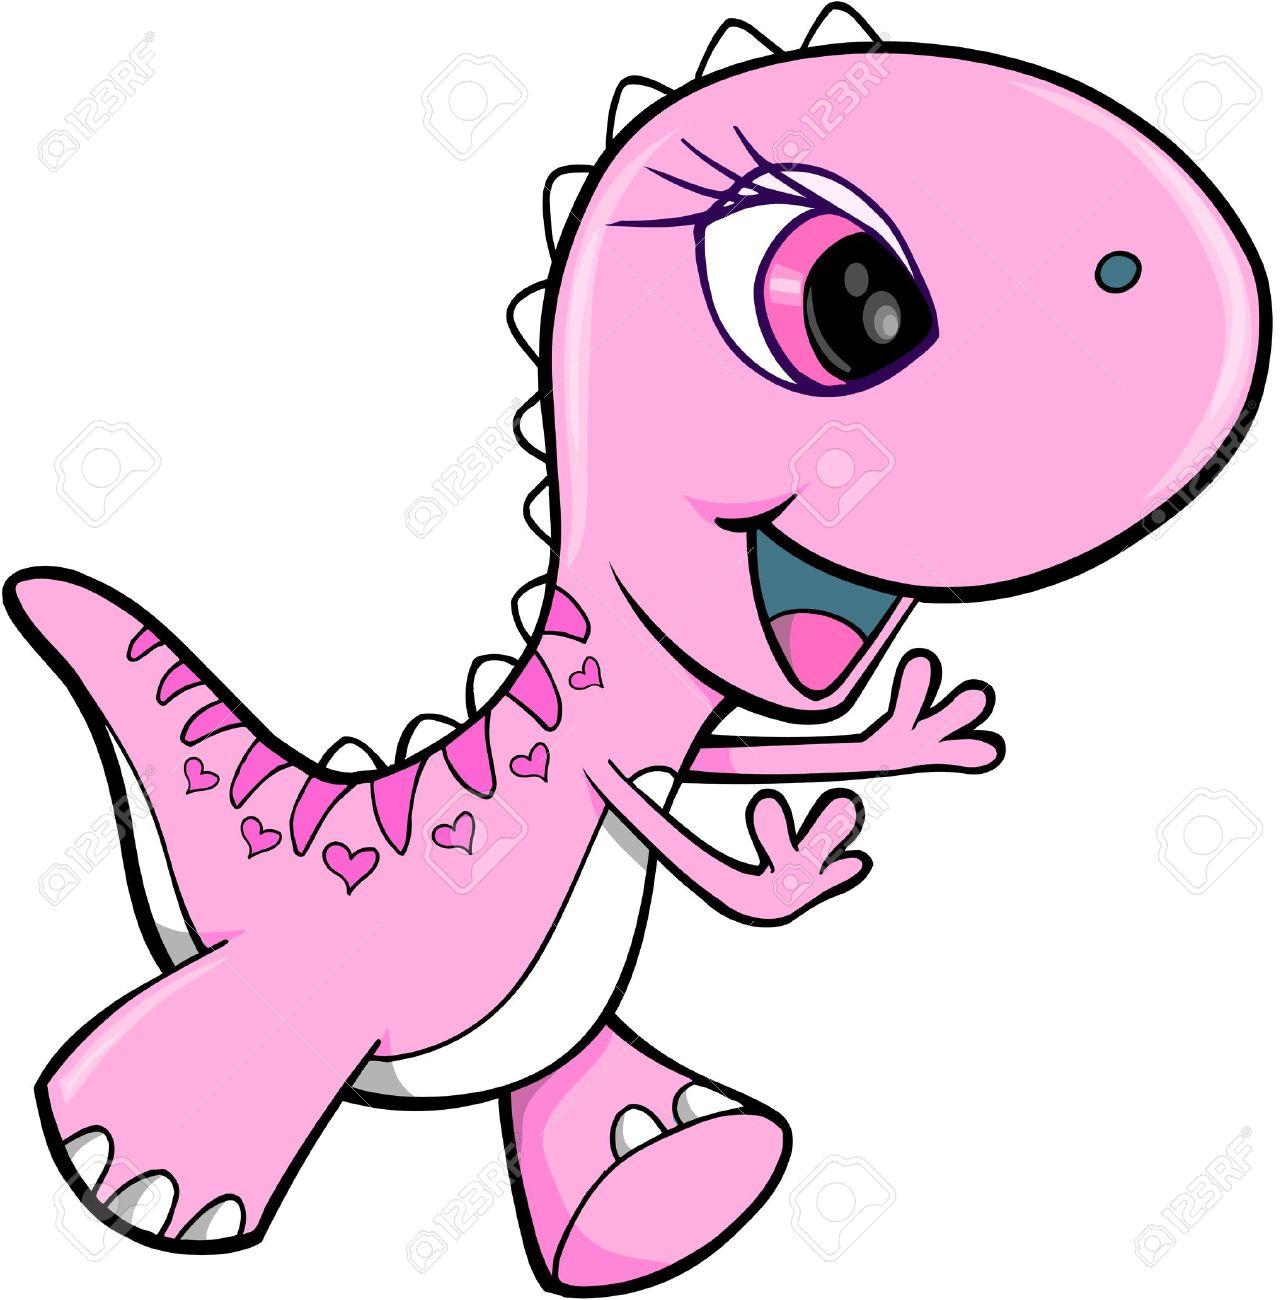 1281x1300 Girl Dinosaur Clip Art To Color